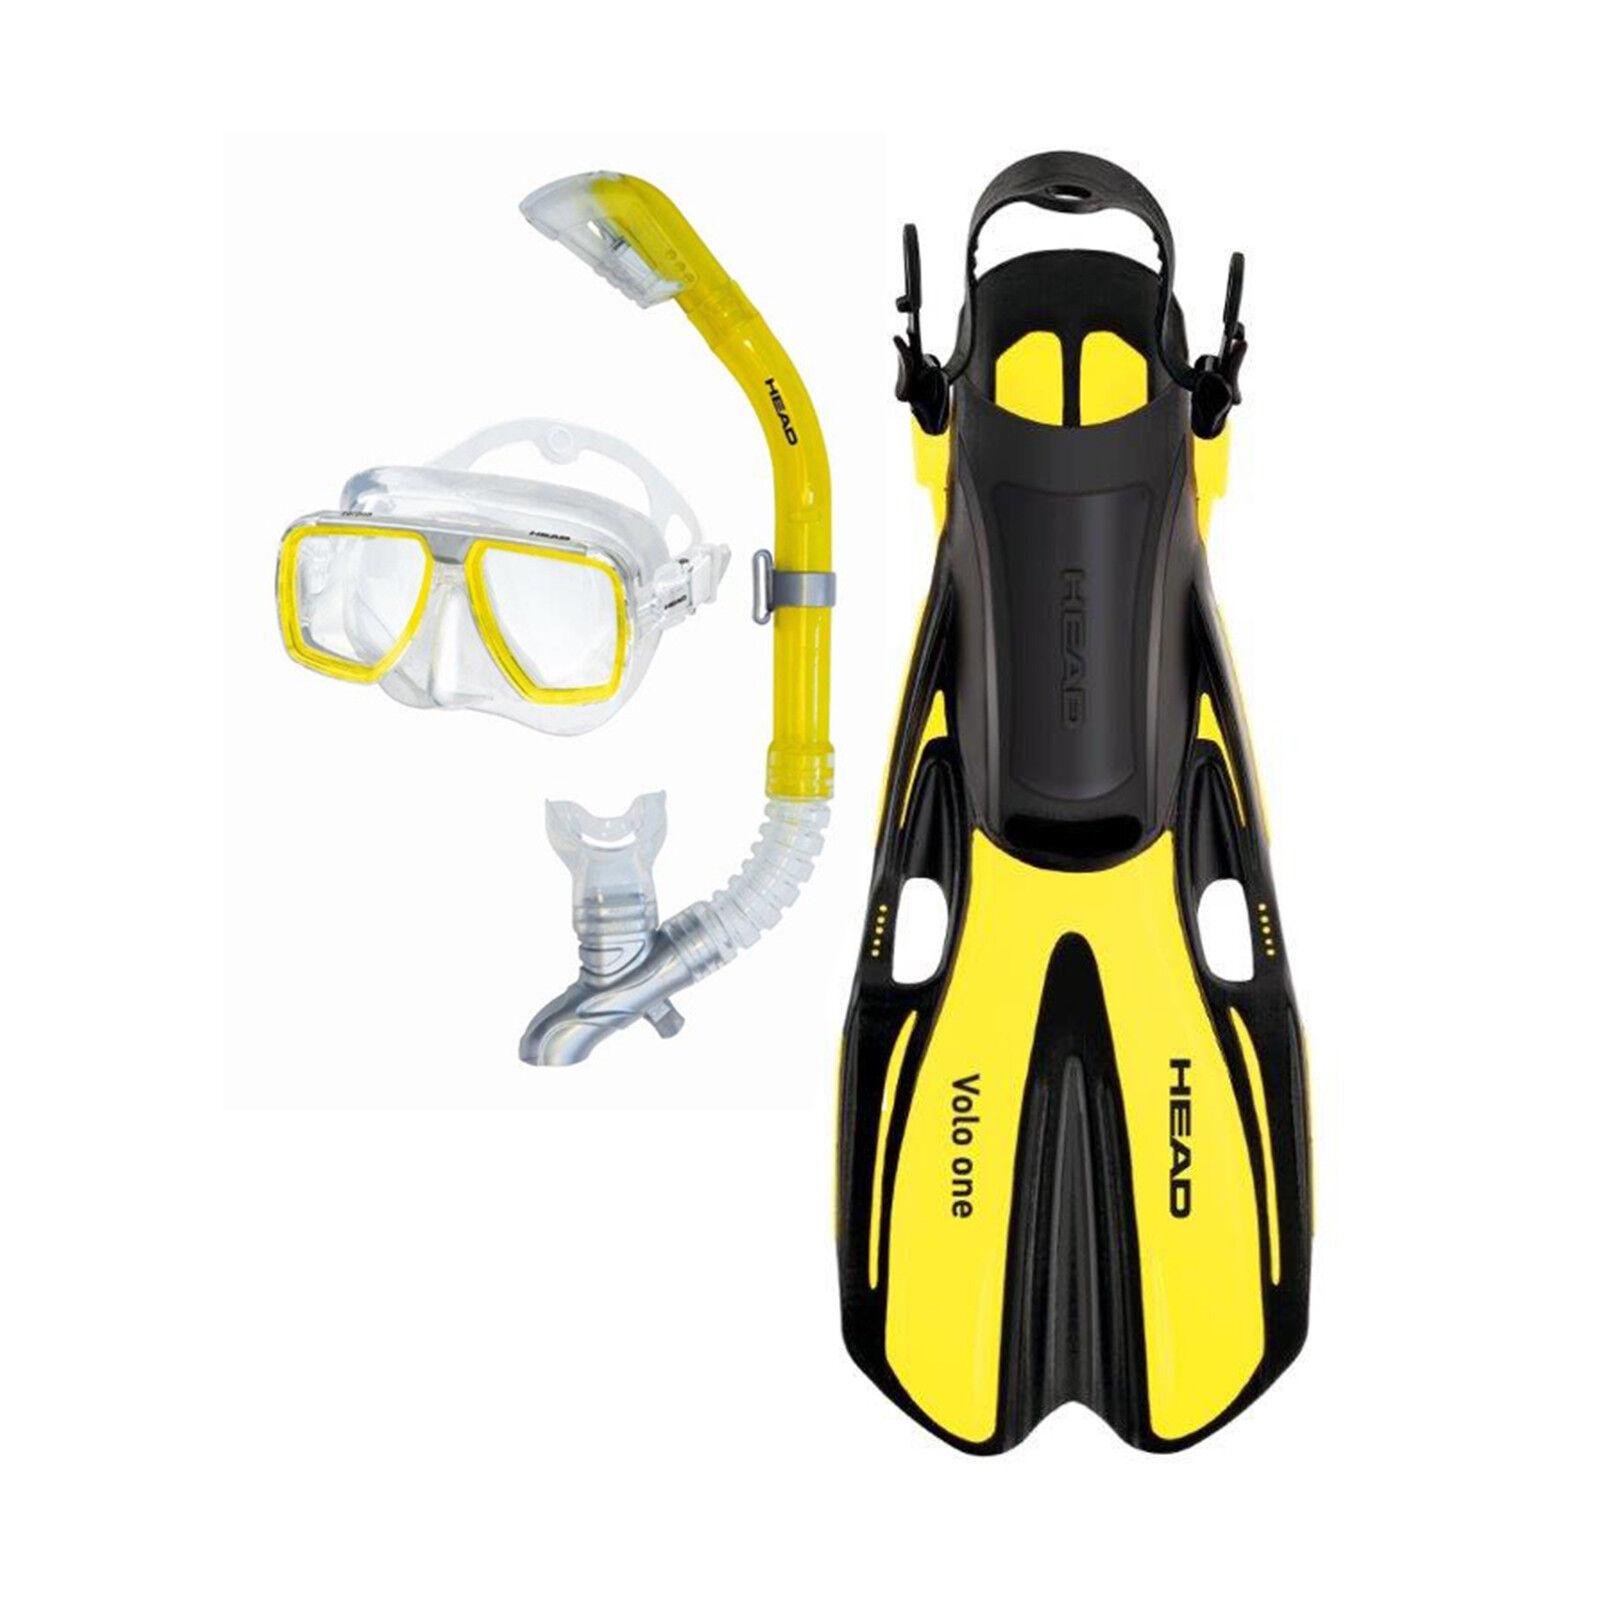 Head Tarpon2 Barracuda Volo Mask Snorkel Fins Set Scuba Diving  Snorkeling Yellow  fast shipping worldwide